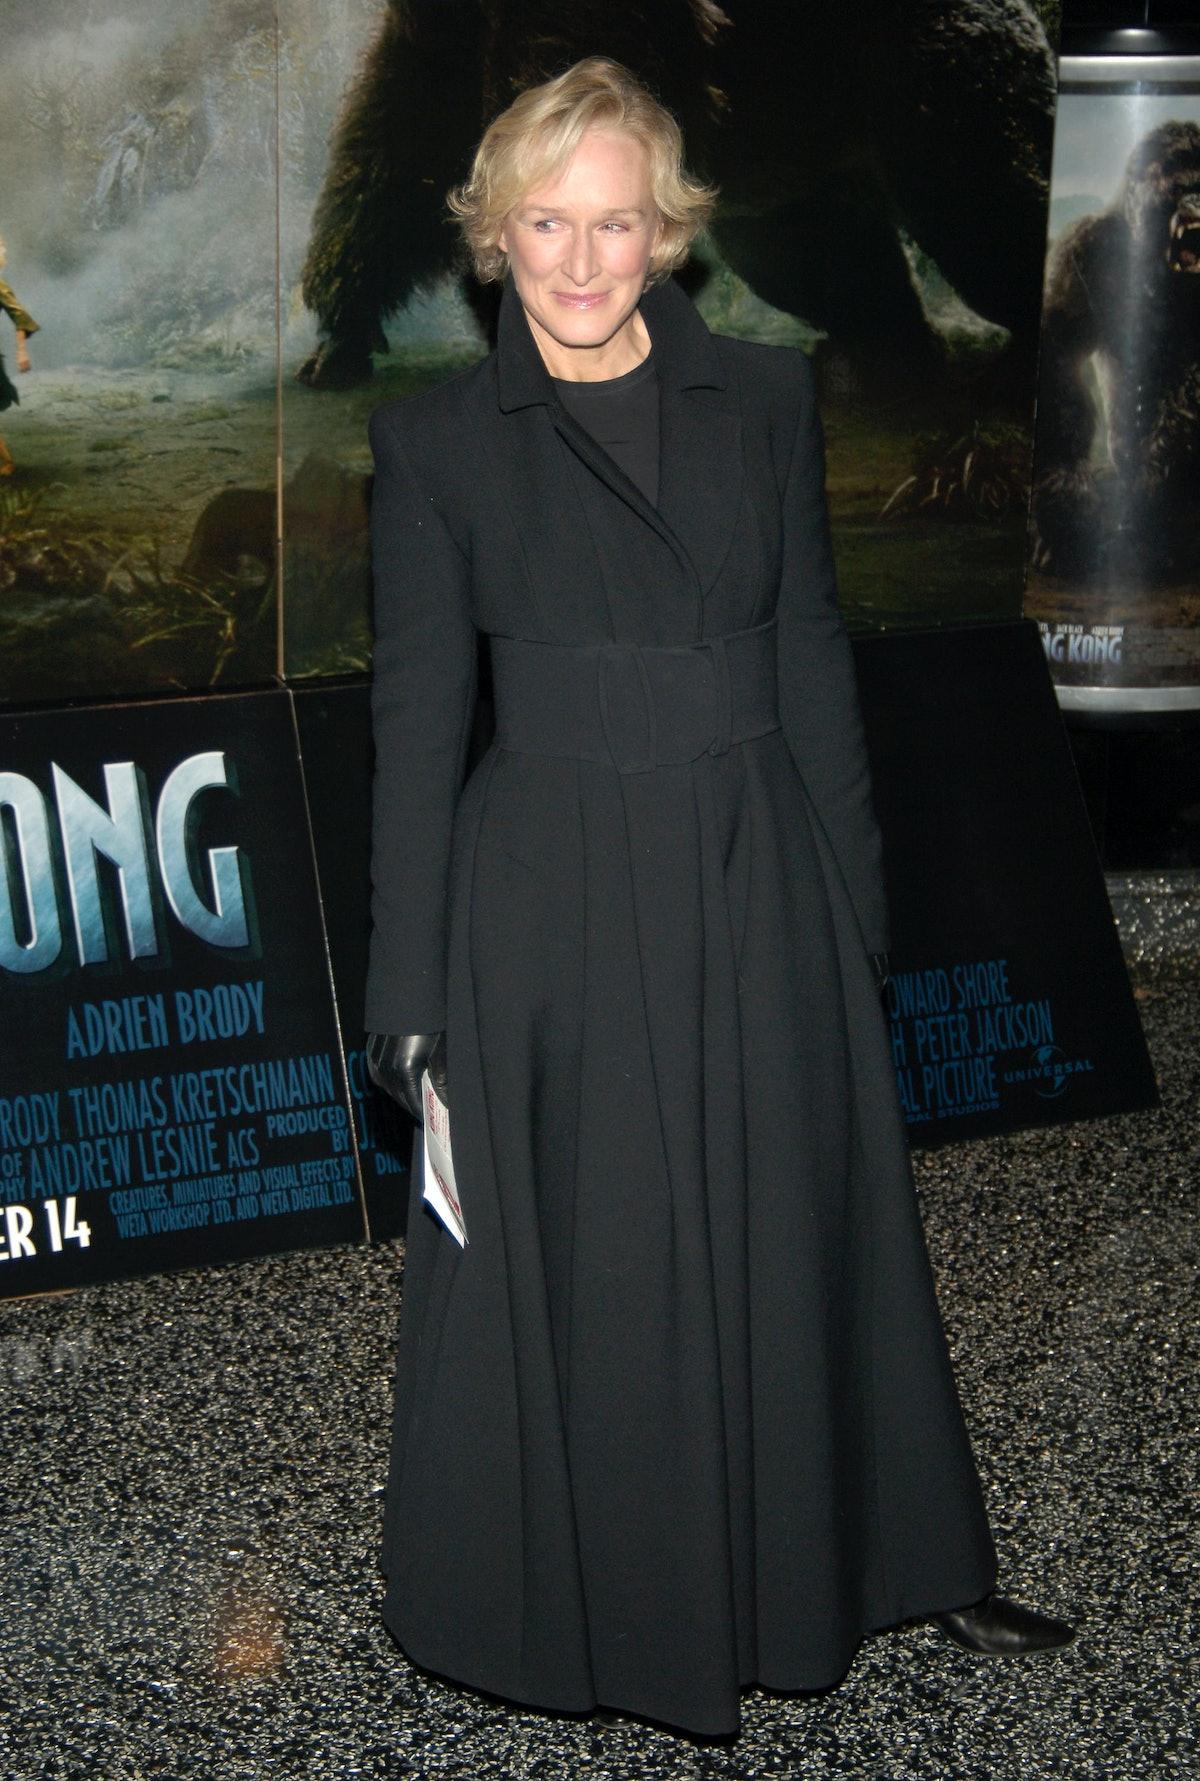 Glenn wearing an all black coat and dress ensemble